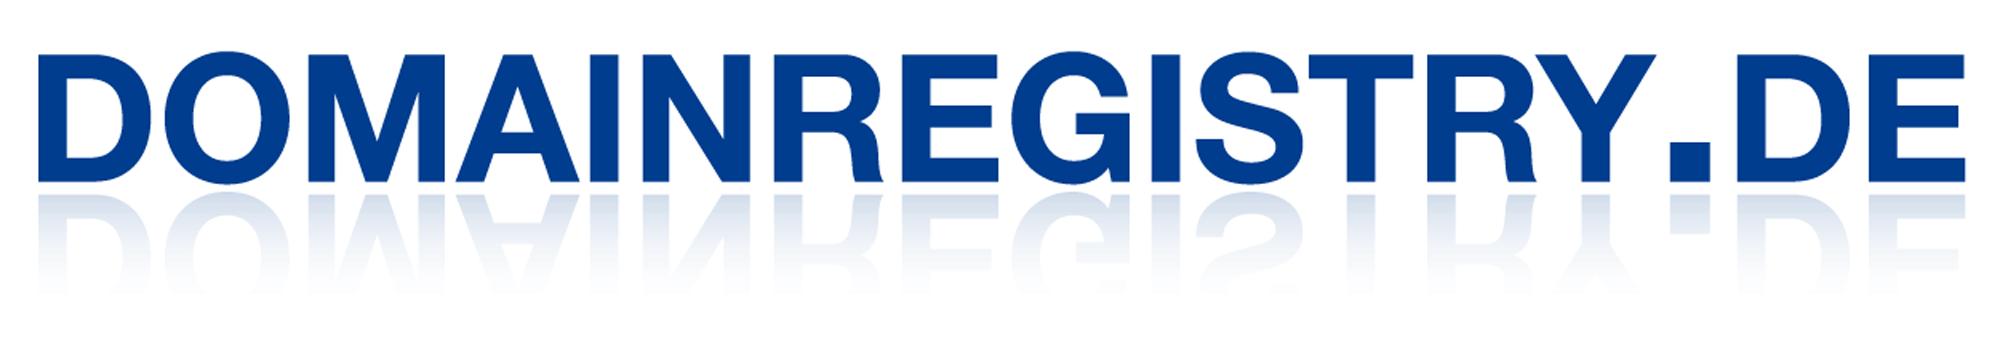 Domainregistry De Großes Logo